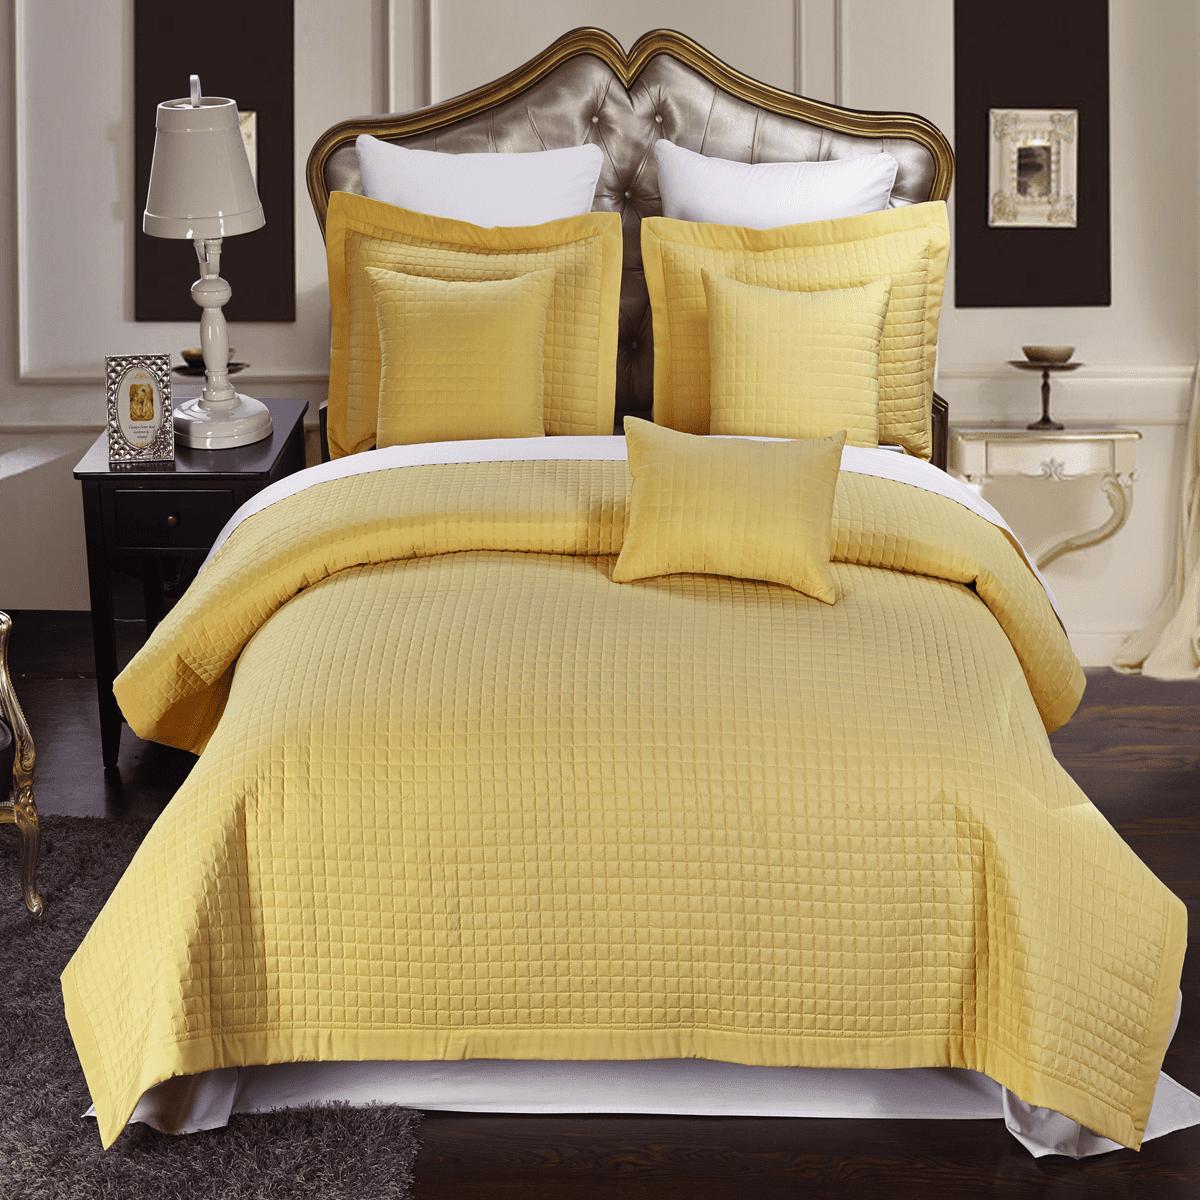 Luxury Soft Checkered Diamond Stitched 2 Piece Coverlet Set Wrinkle-Free Reversible All Season Mini Bedspread Set -Gray-Twin/Twin XL